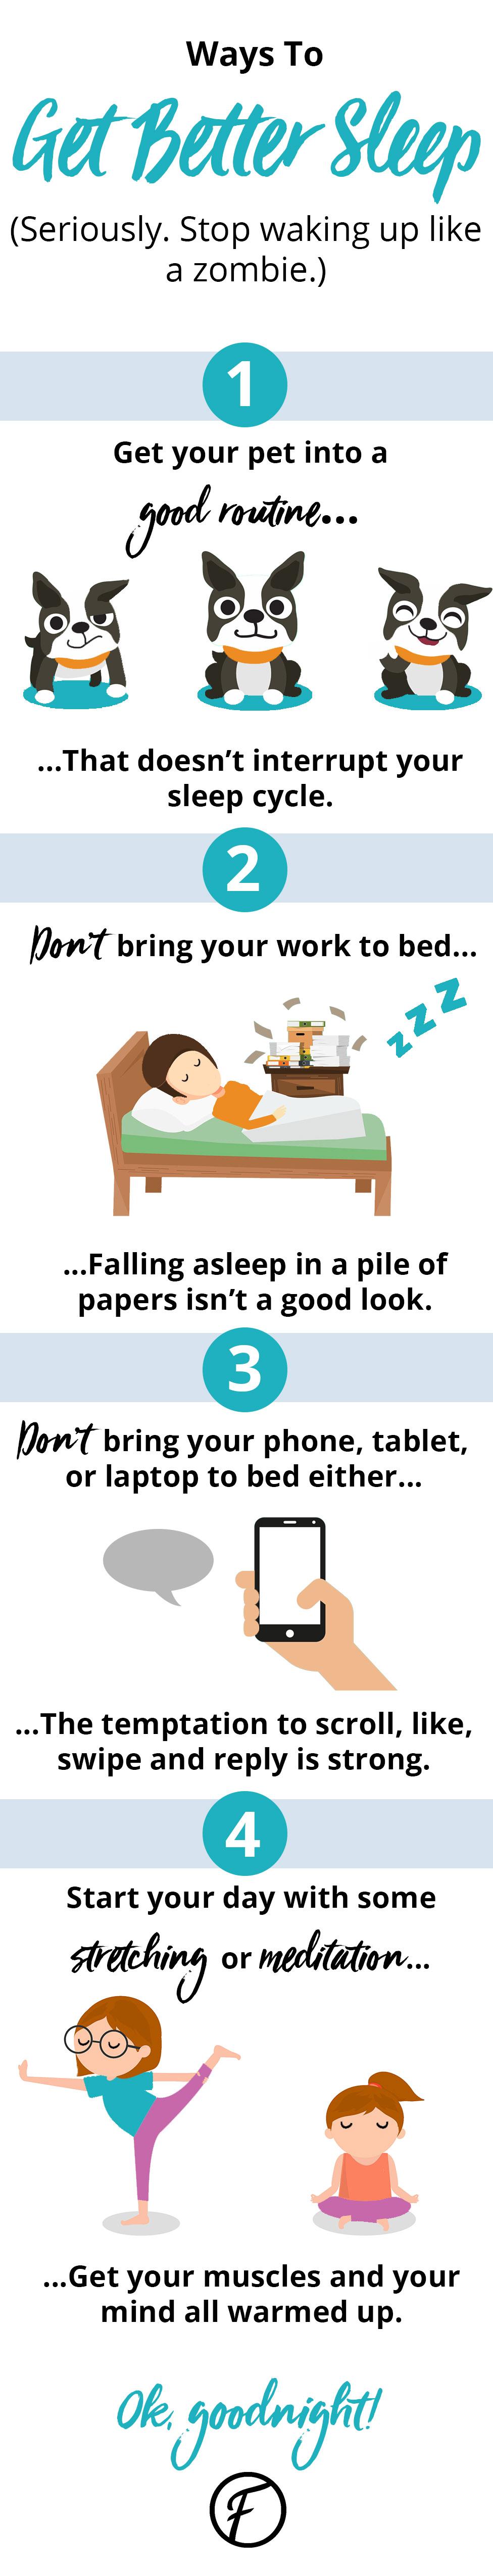 Infographic_Get_Better_Sleep